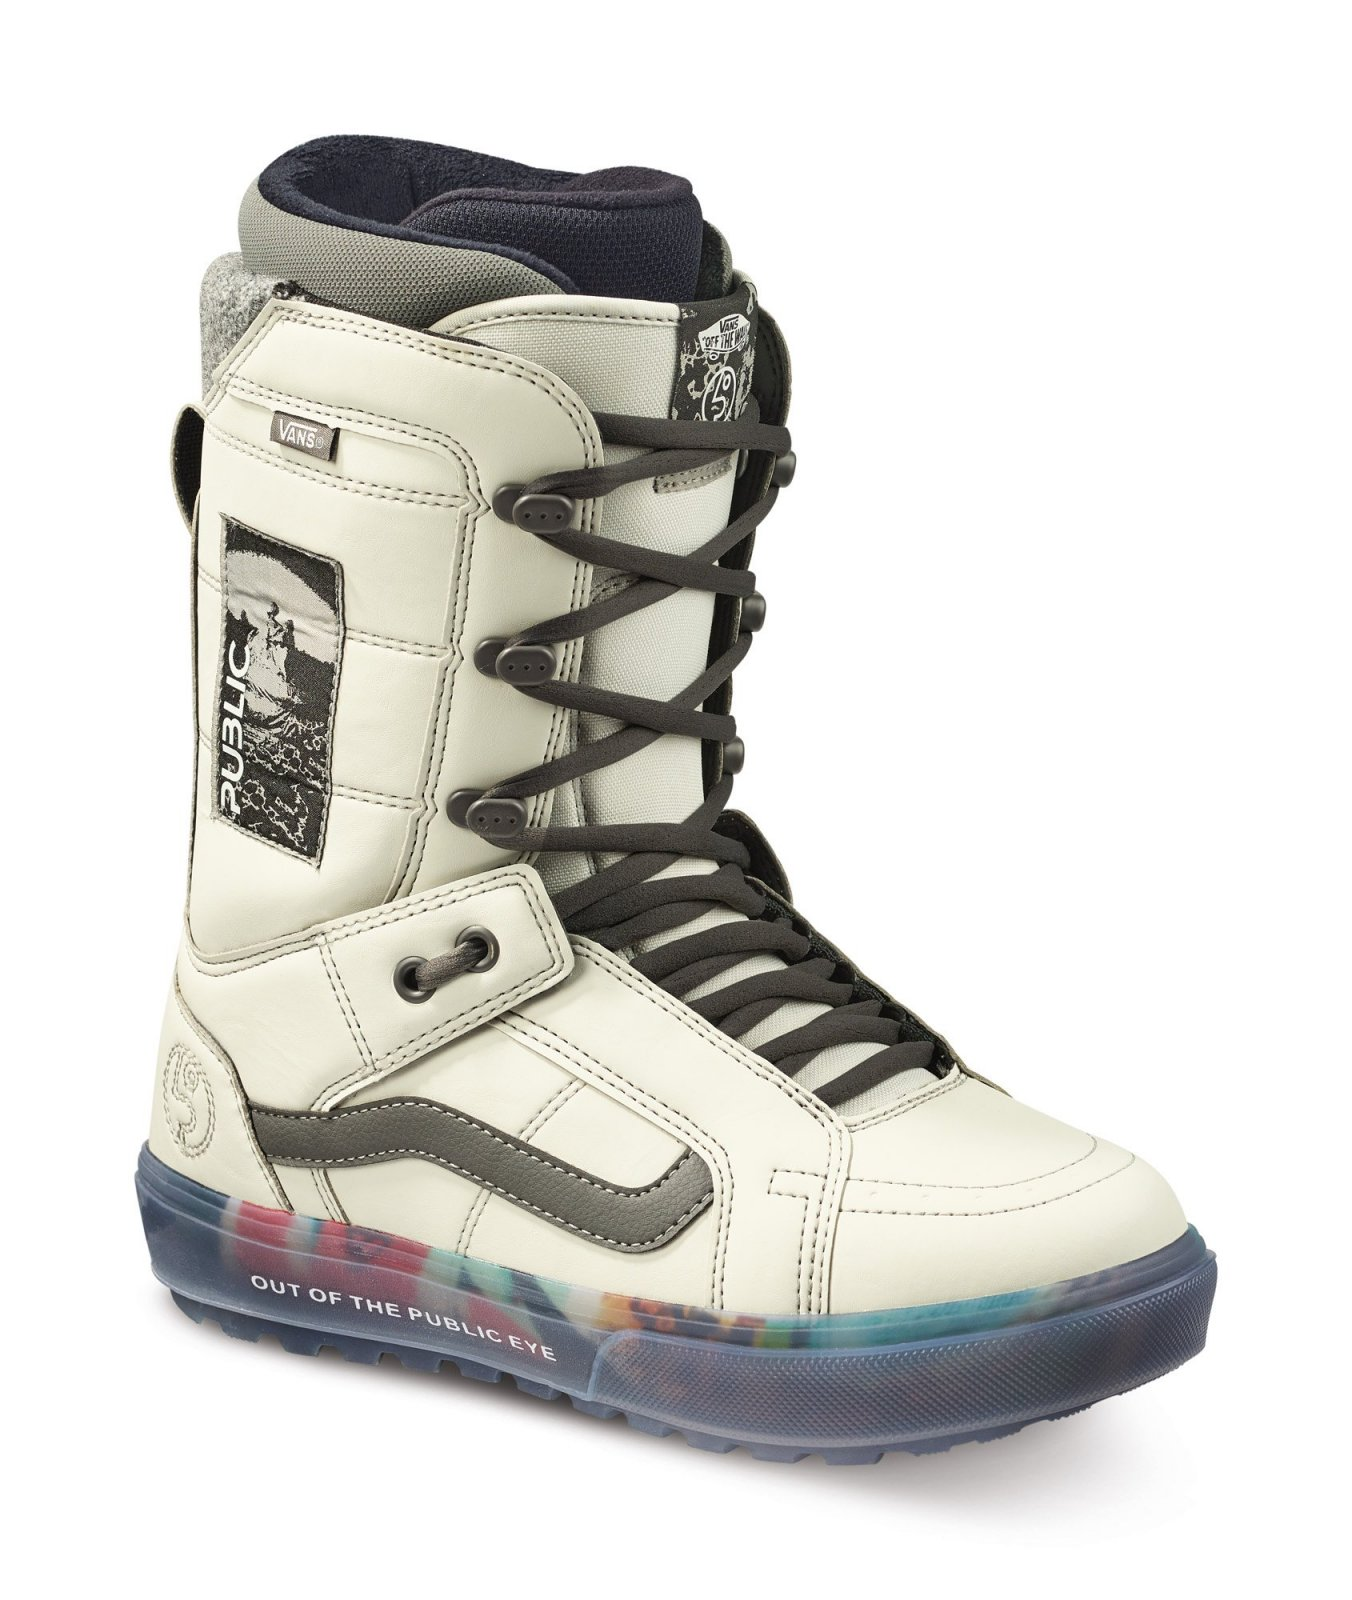 2022 Vans Hi-Standard OG Men's Snowboard Boot - (Public) Grey / Vaporous Grey